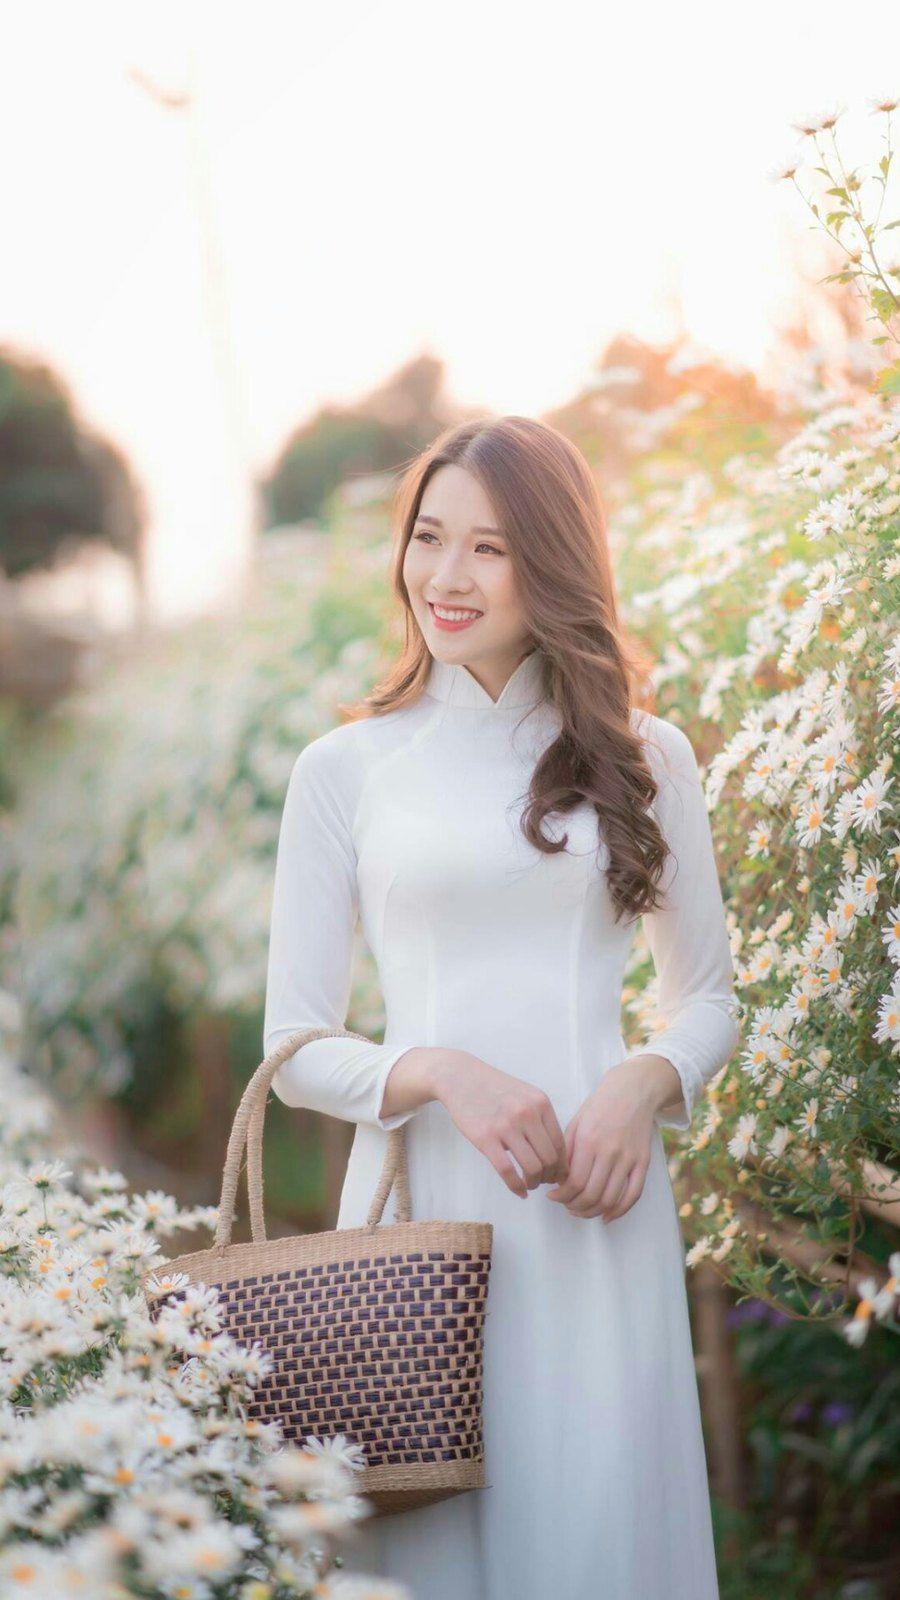 Abi-Titmuss | Dresses, Fashion, White dress